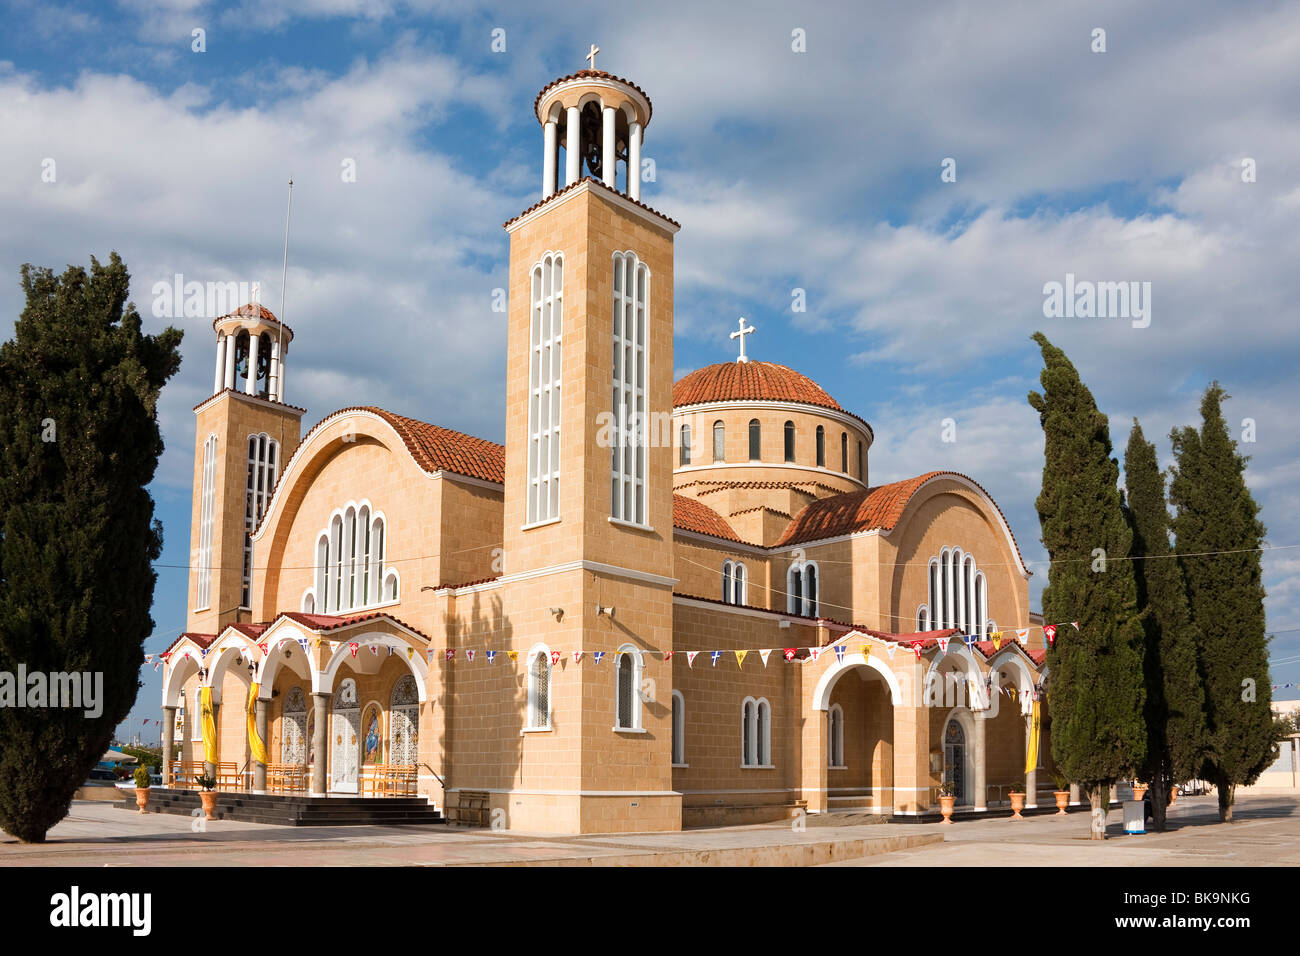 New Church of St. George, Agios Georgios, Paralimni, Cyprus, South Cyprus, Greek, Europe - Stock Image